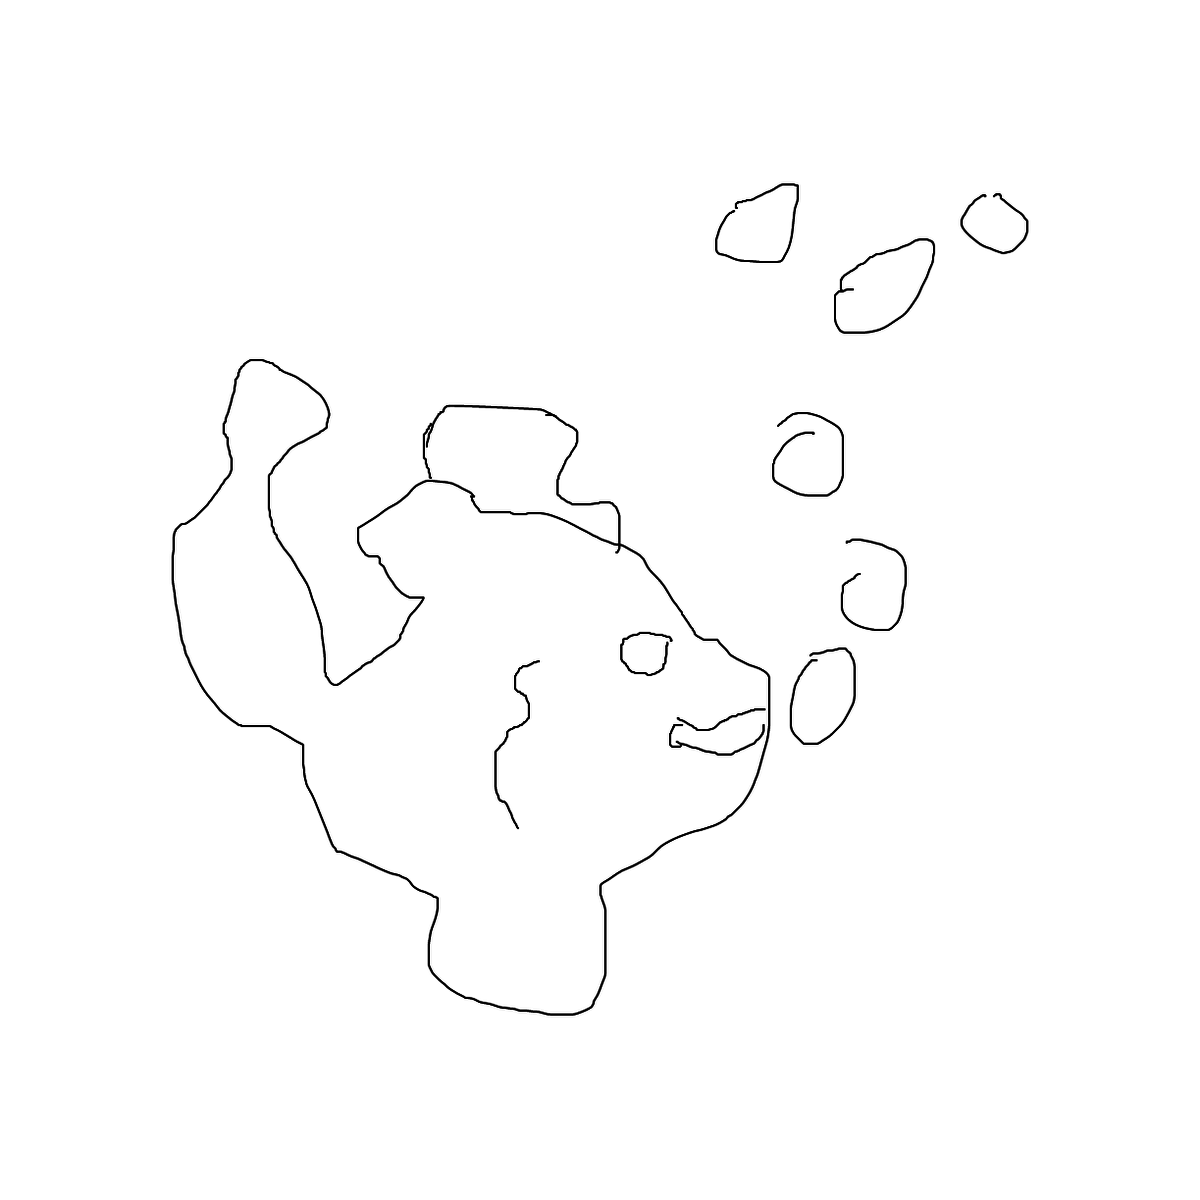 BAAAM drawing#780 lat:33.4892883300781250lng: -112.0806350708007800